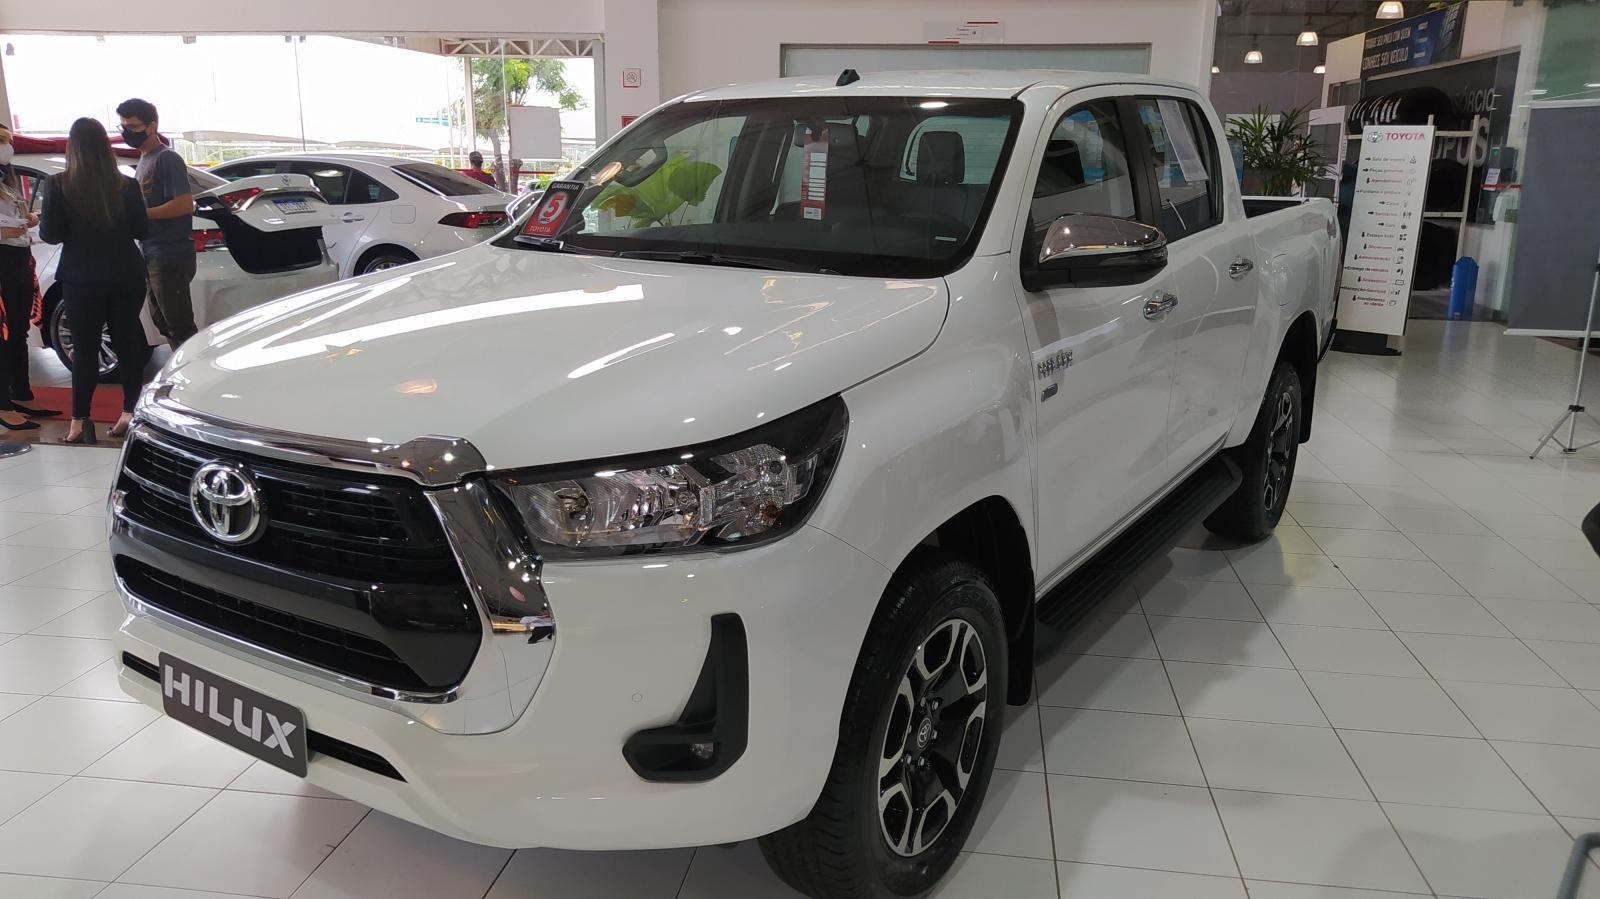 //www.autoline.com.br/carro/toyota/hilux-28-cd-srv-16v-diesel-4p-4x4-turbo-automatico/2021/brasilia-df/15782388